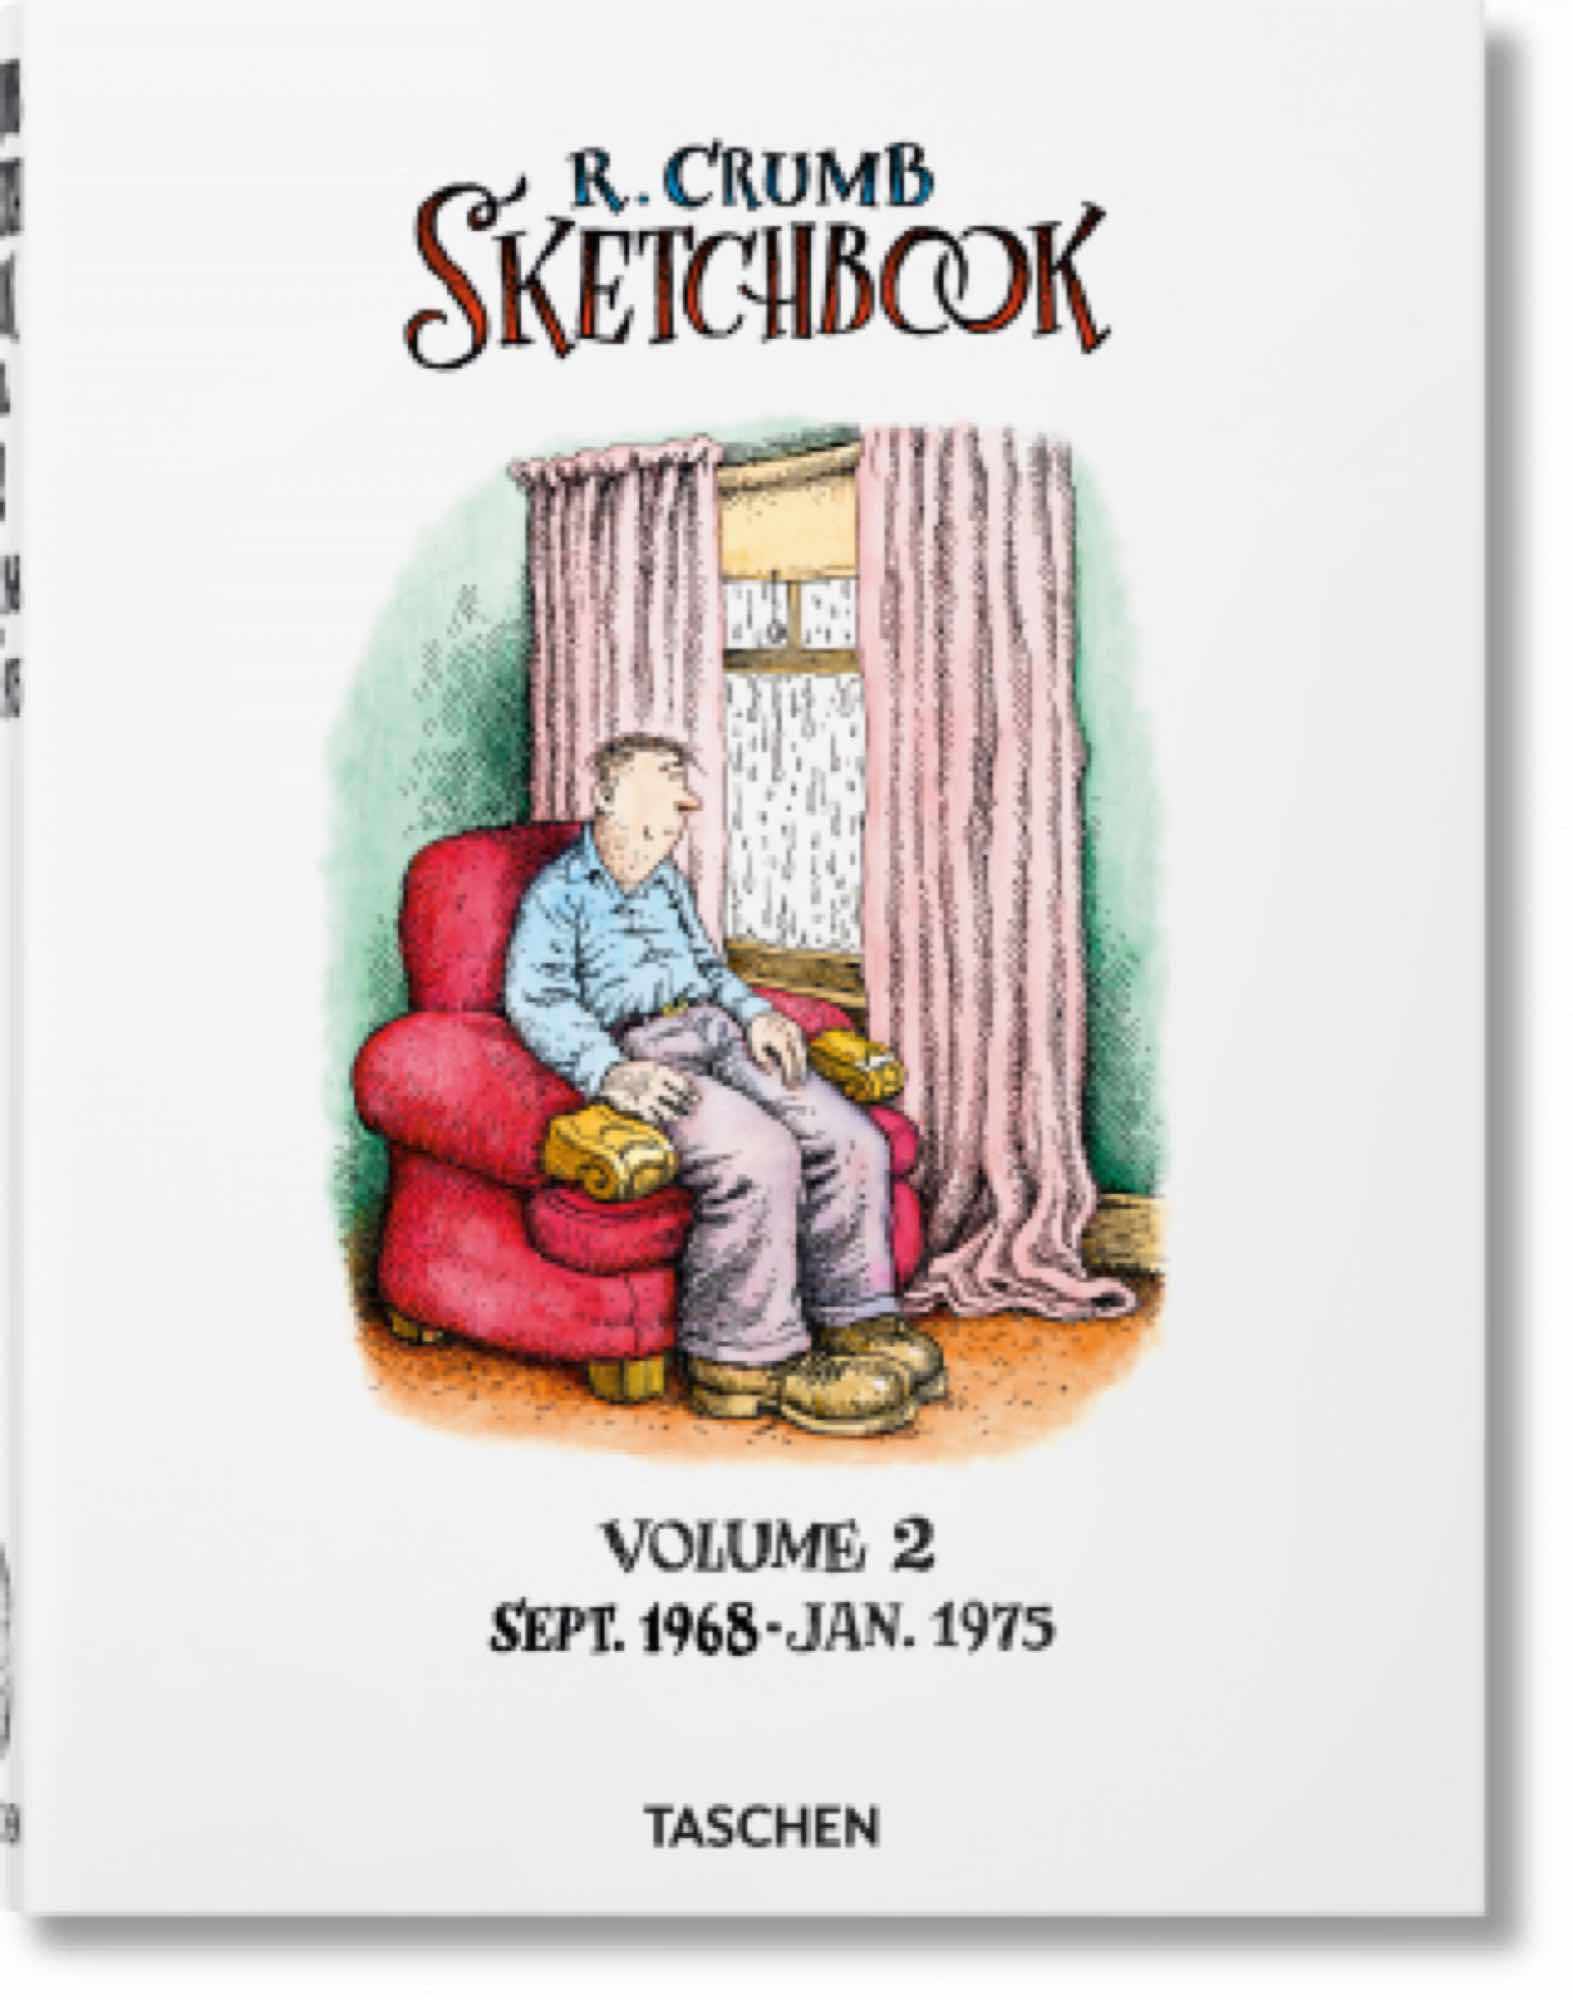 ROBERT CRUMB. SKETCHBOOK. VOL. 2: SEPT 1968-JAN 1975